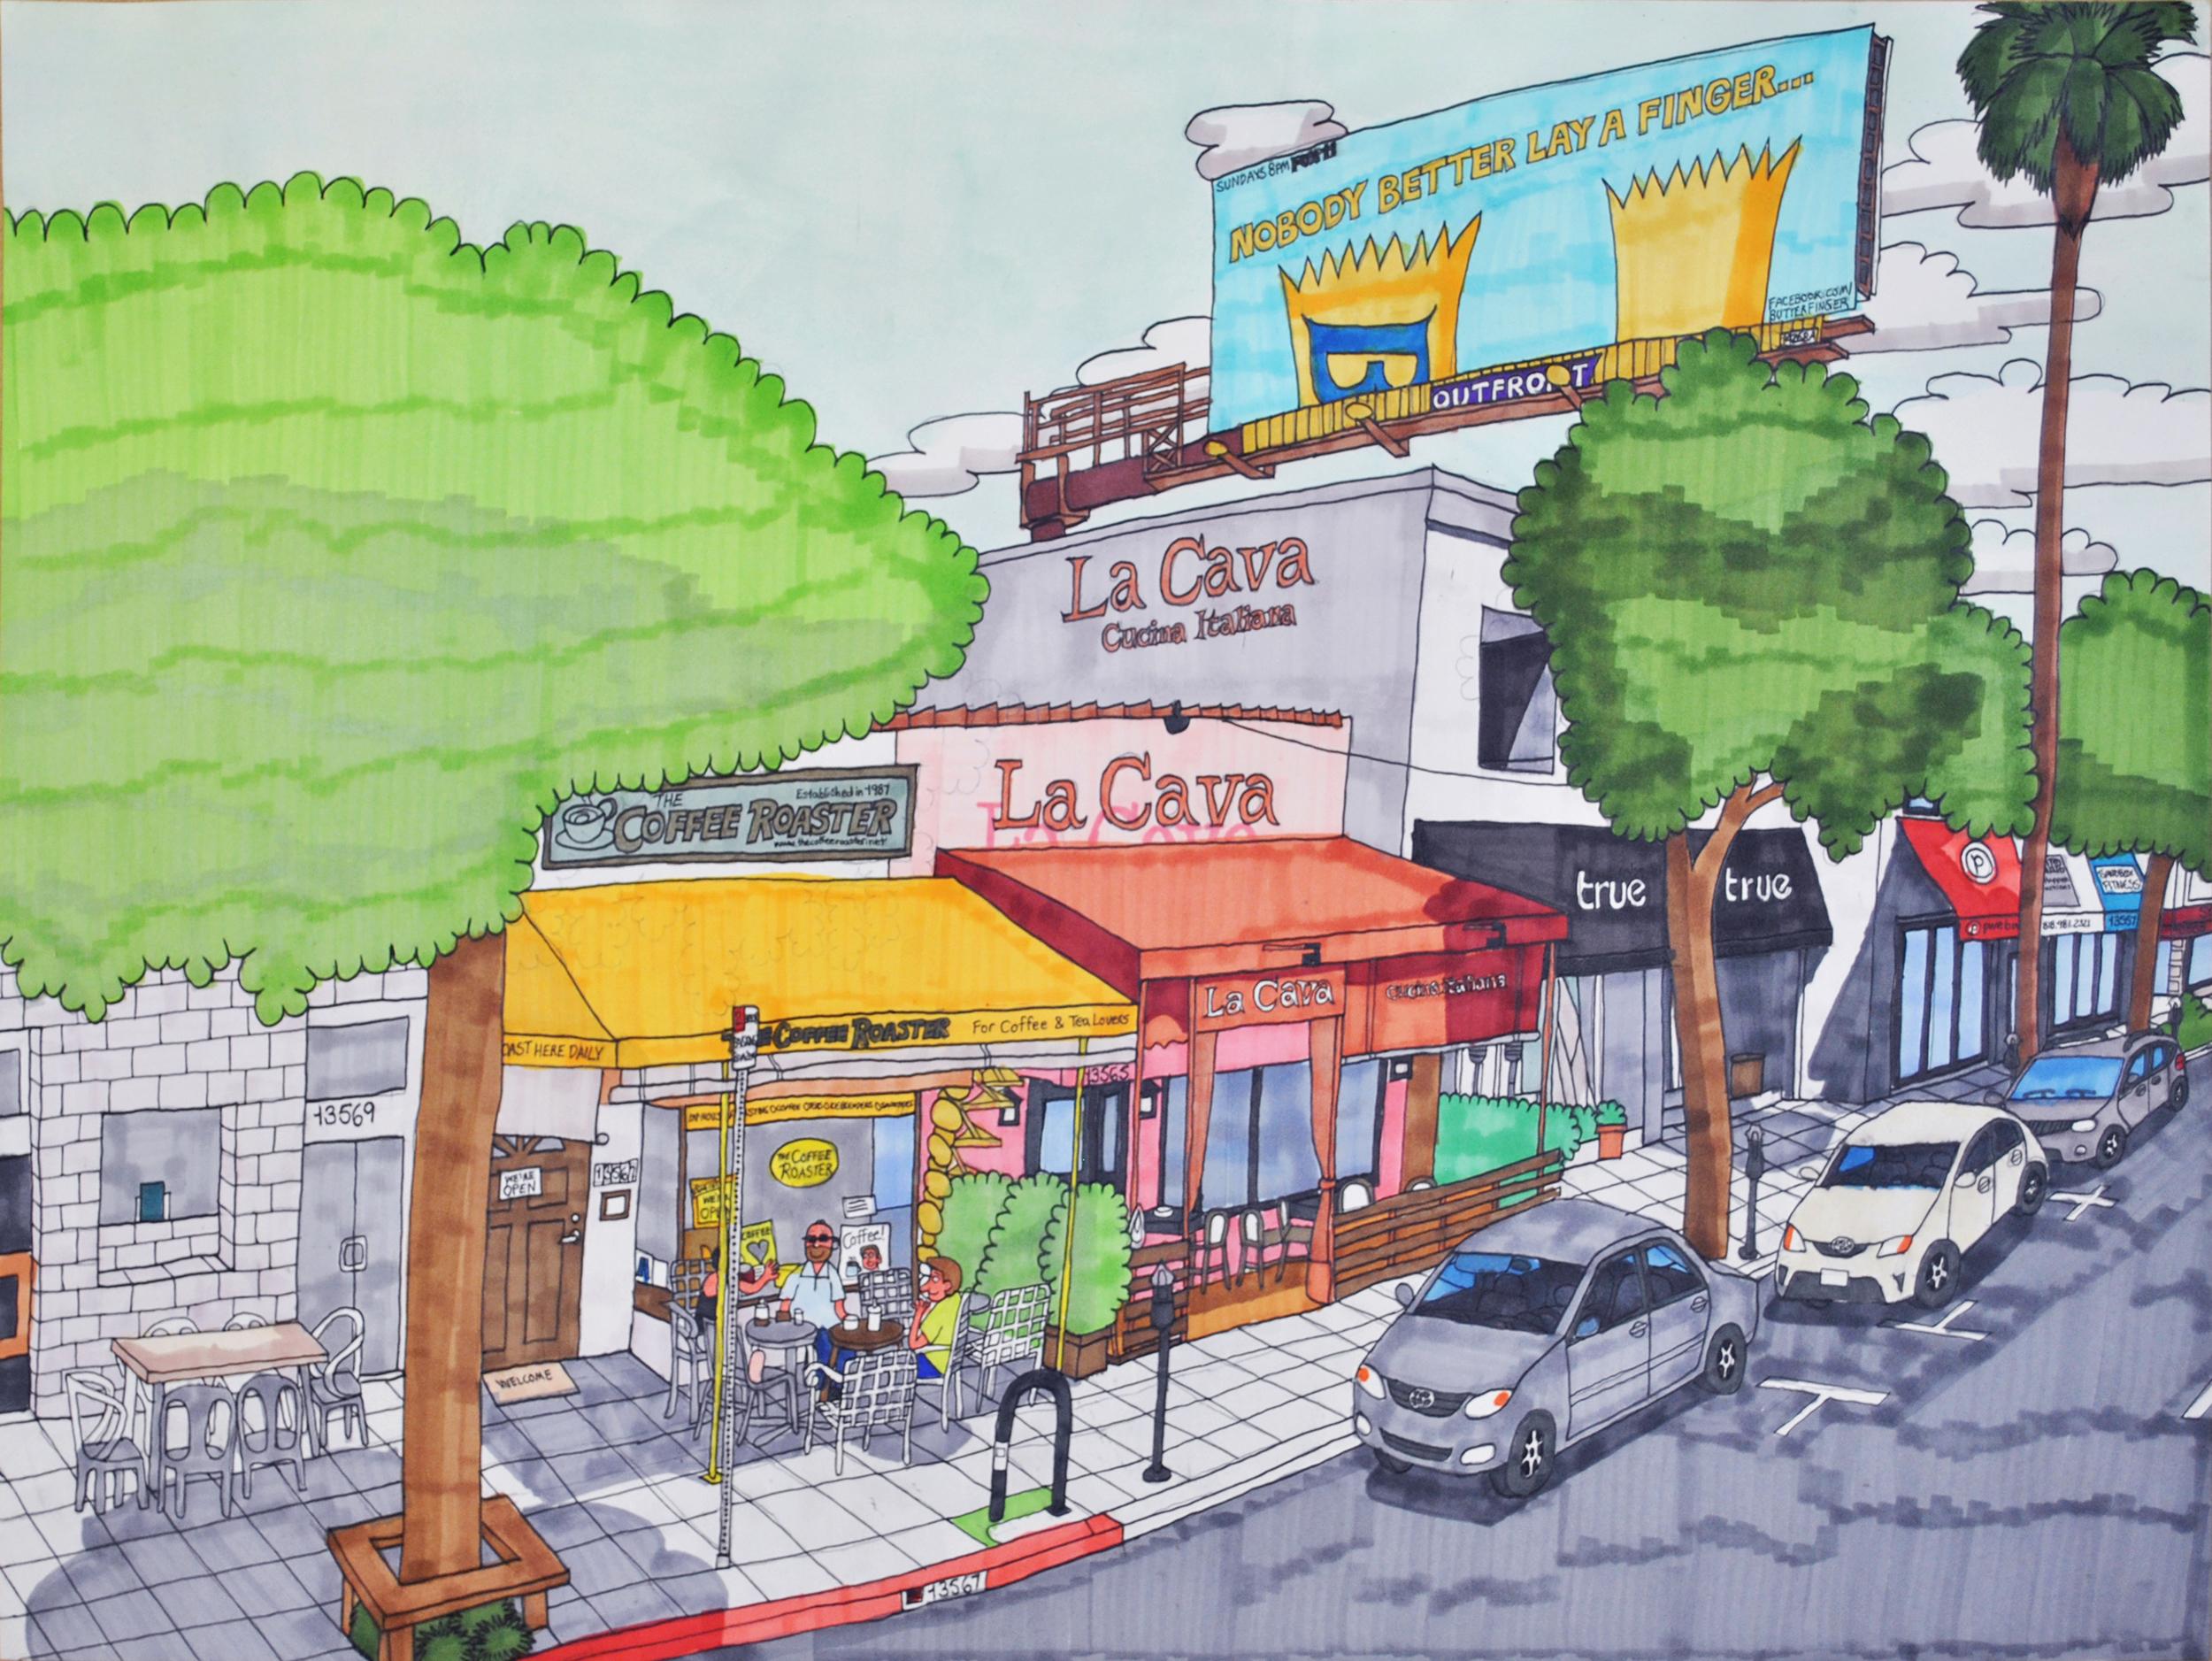 "The Coffee Roaster, 13567 Ventura Boulevard, Sherman Oaks, California,  graphite, micron, and marker on paper, 18"" x 24"", 2016"